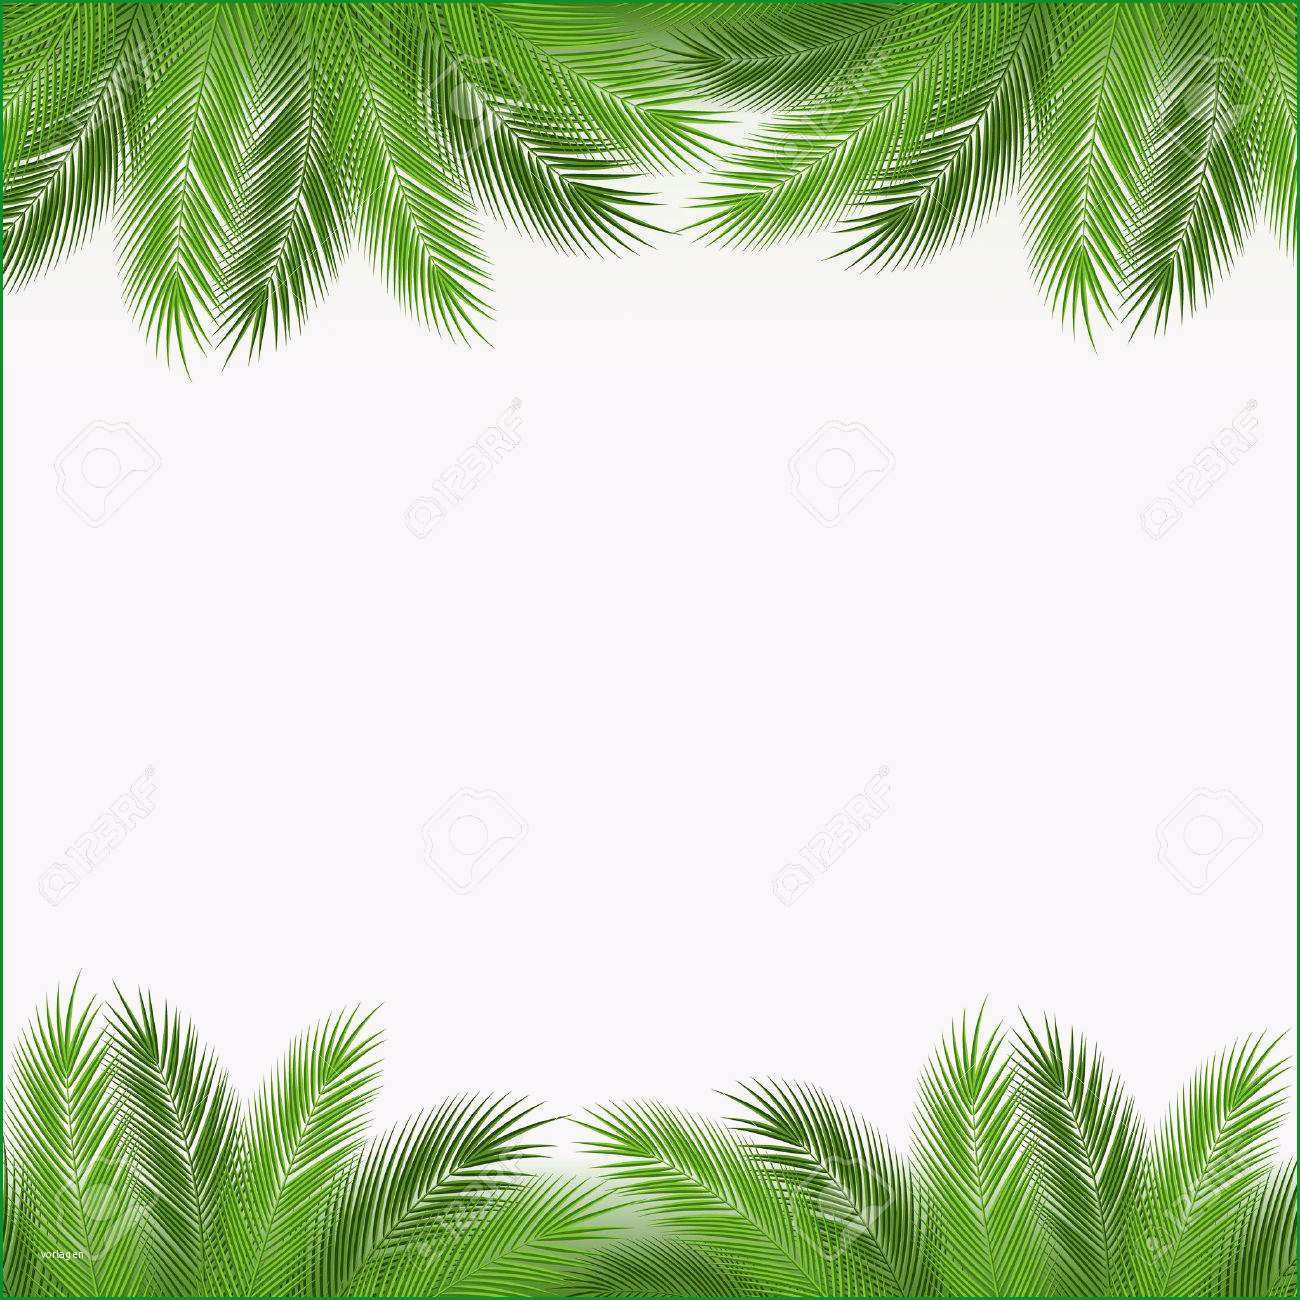 bastelvorlage palme